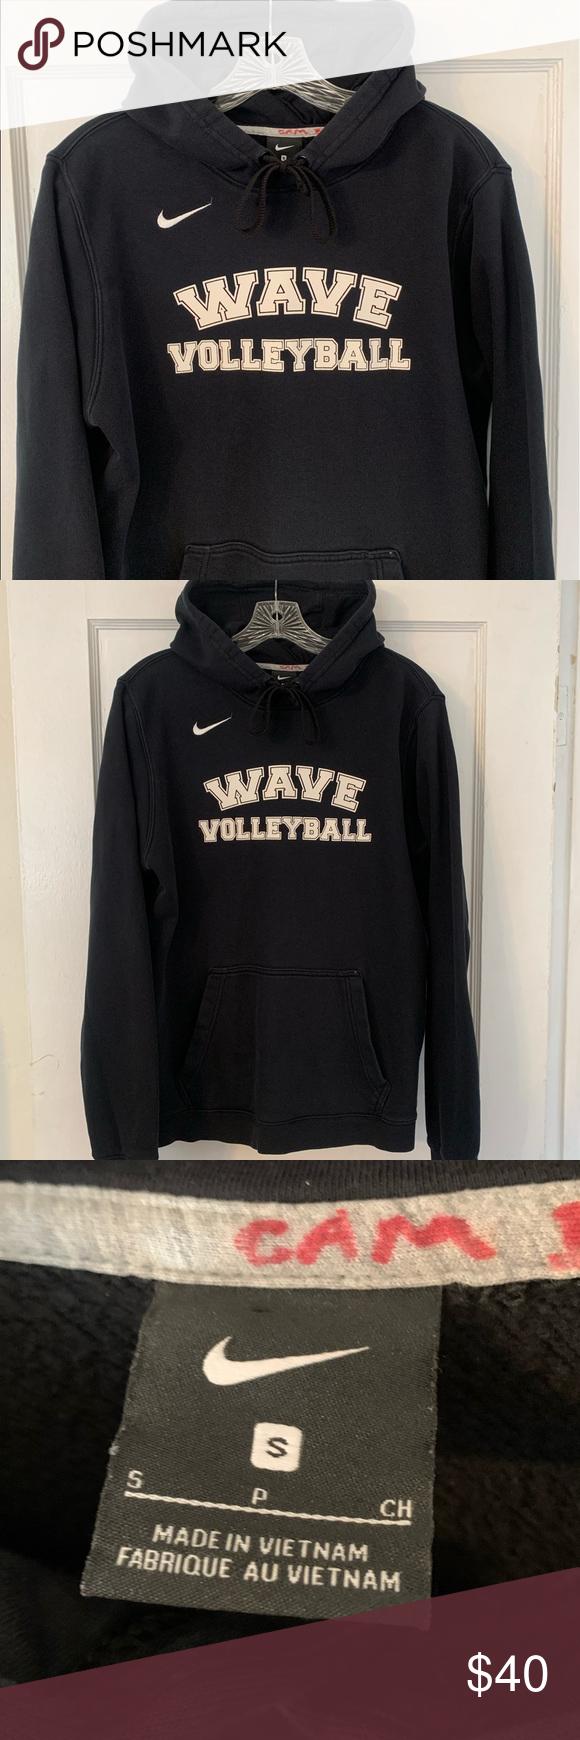 Nike Wave Volleyball Team Spellout Hoodie Sz S Hoodies Sweatshirt Shirt Nike Shirts